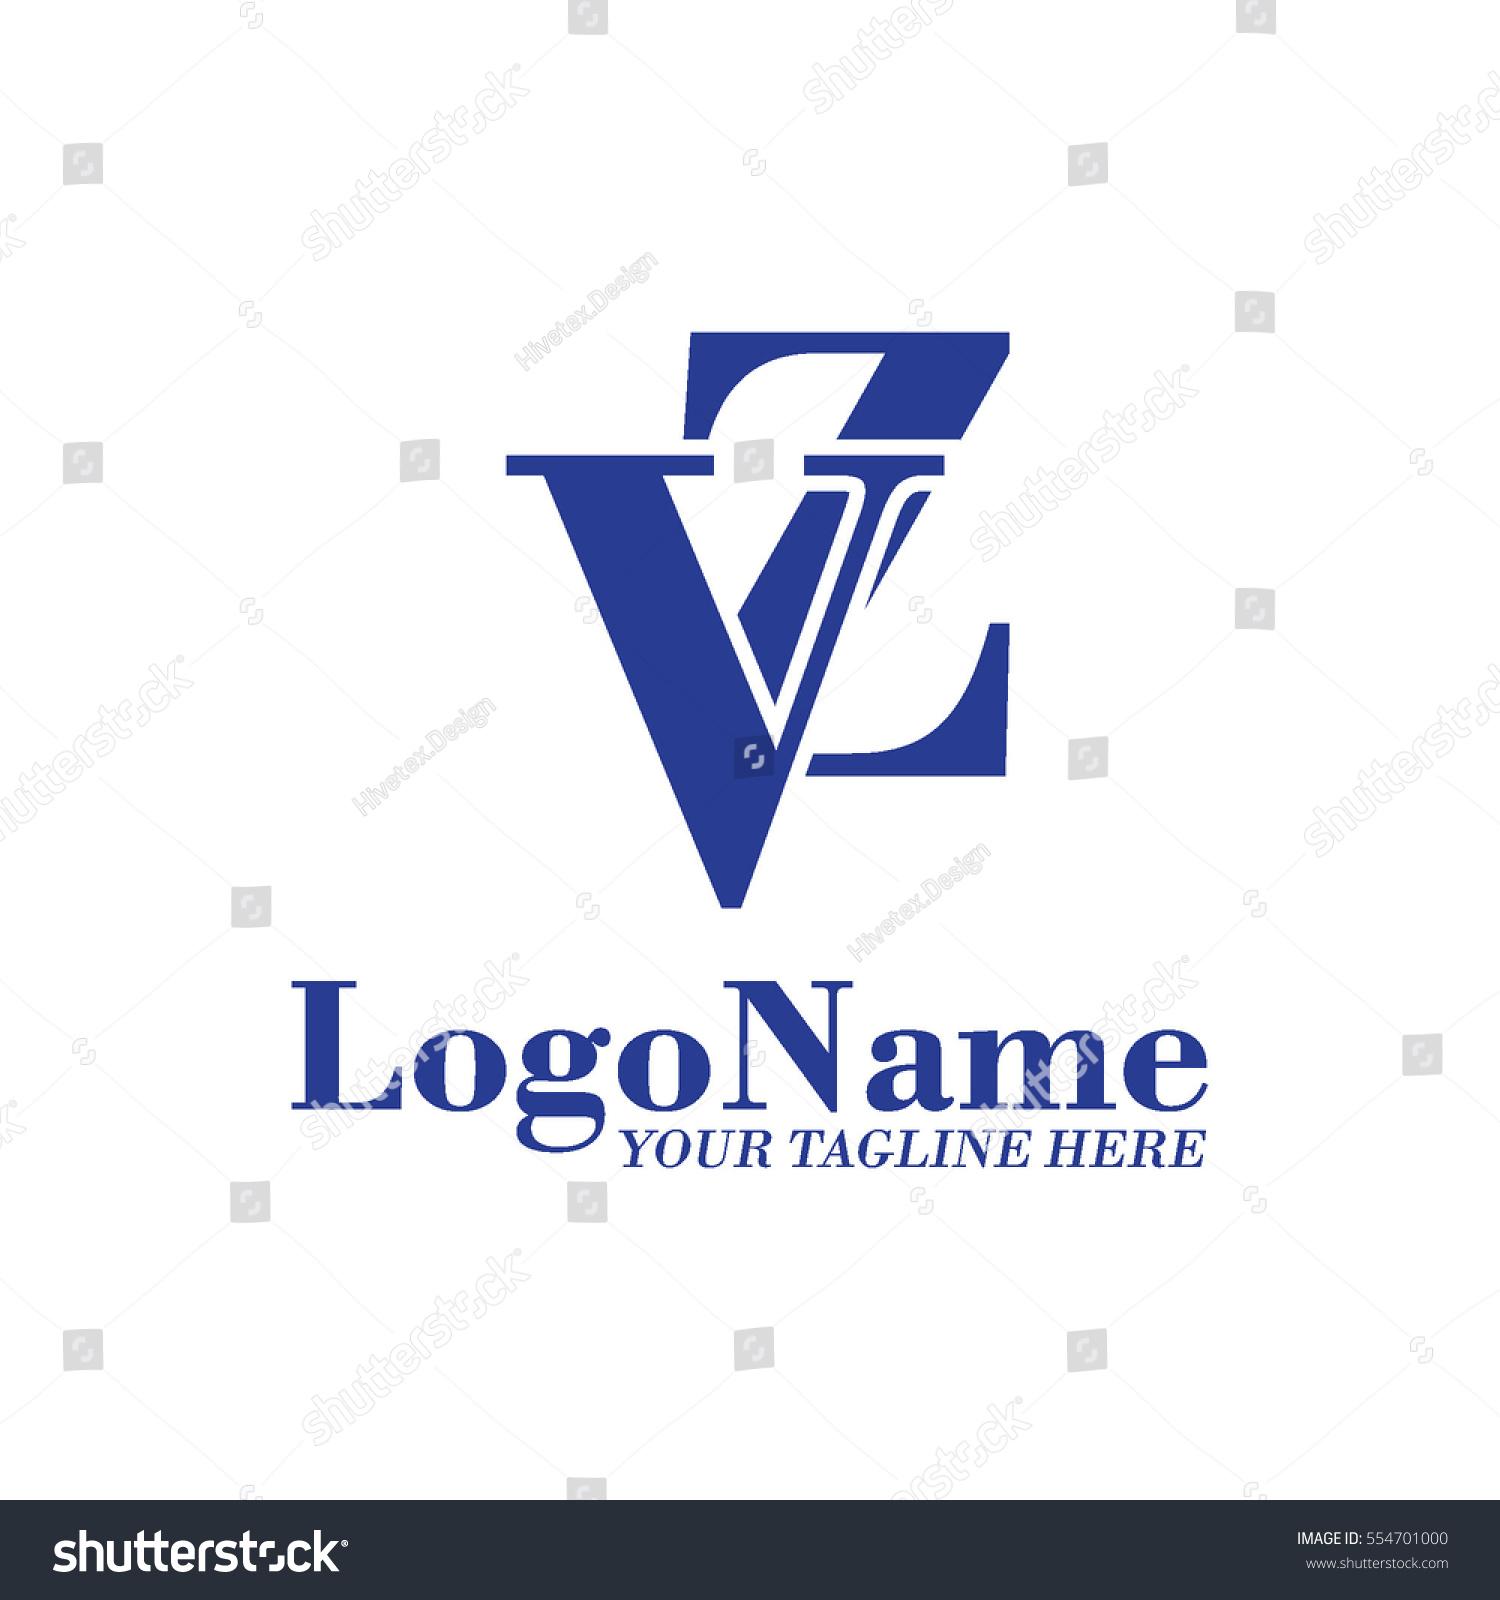 Vz logo stock vector 554701000 shutterstock vz logo biocorpaavc Image collections